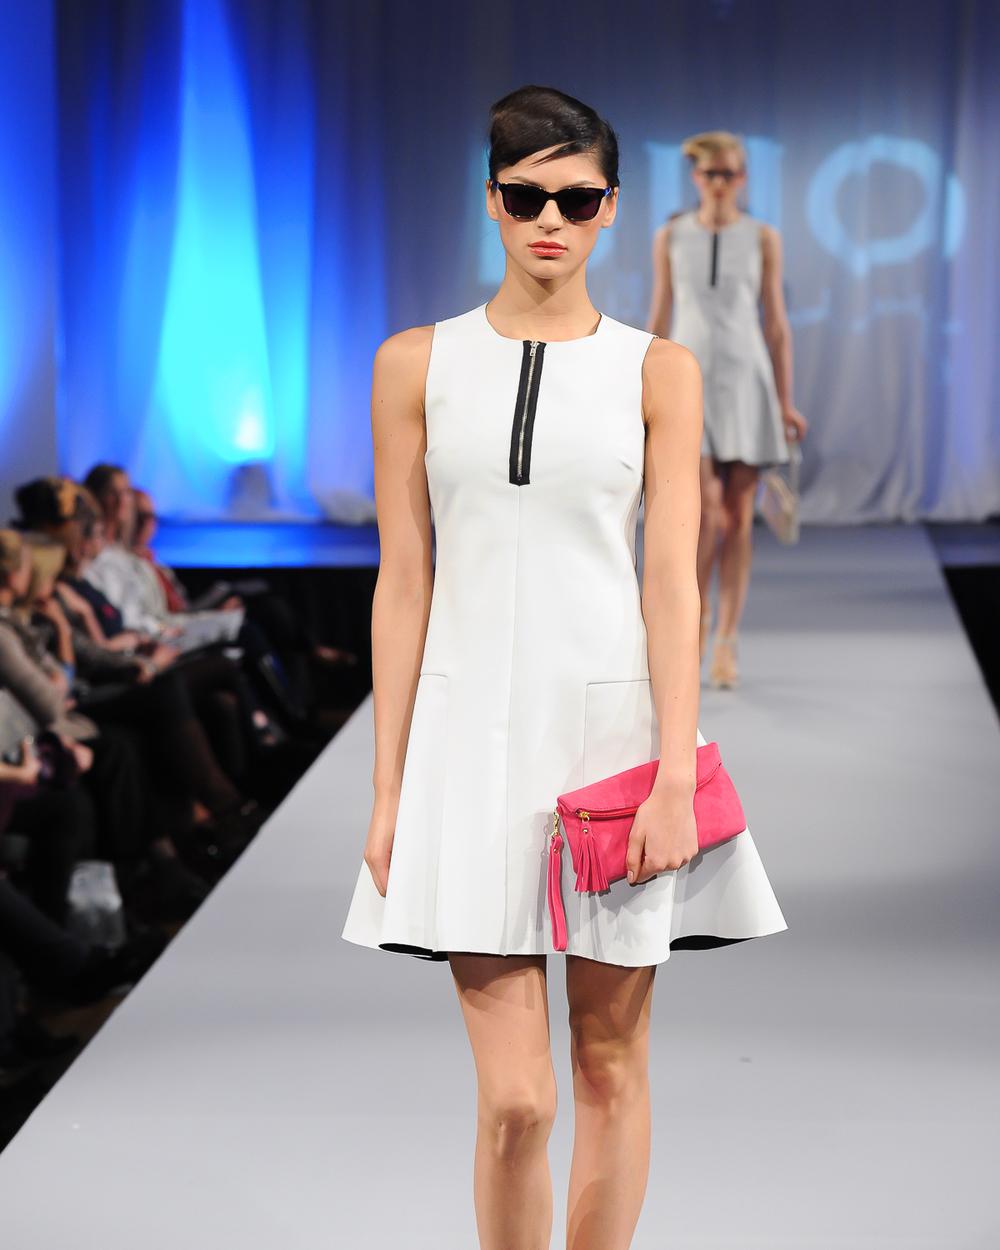 bristol-fashion-photographer-8.jpg